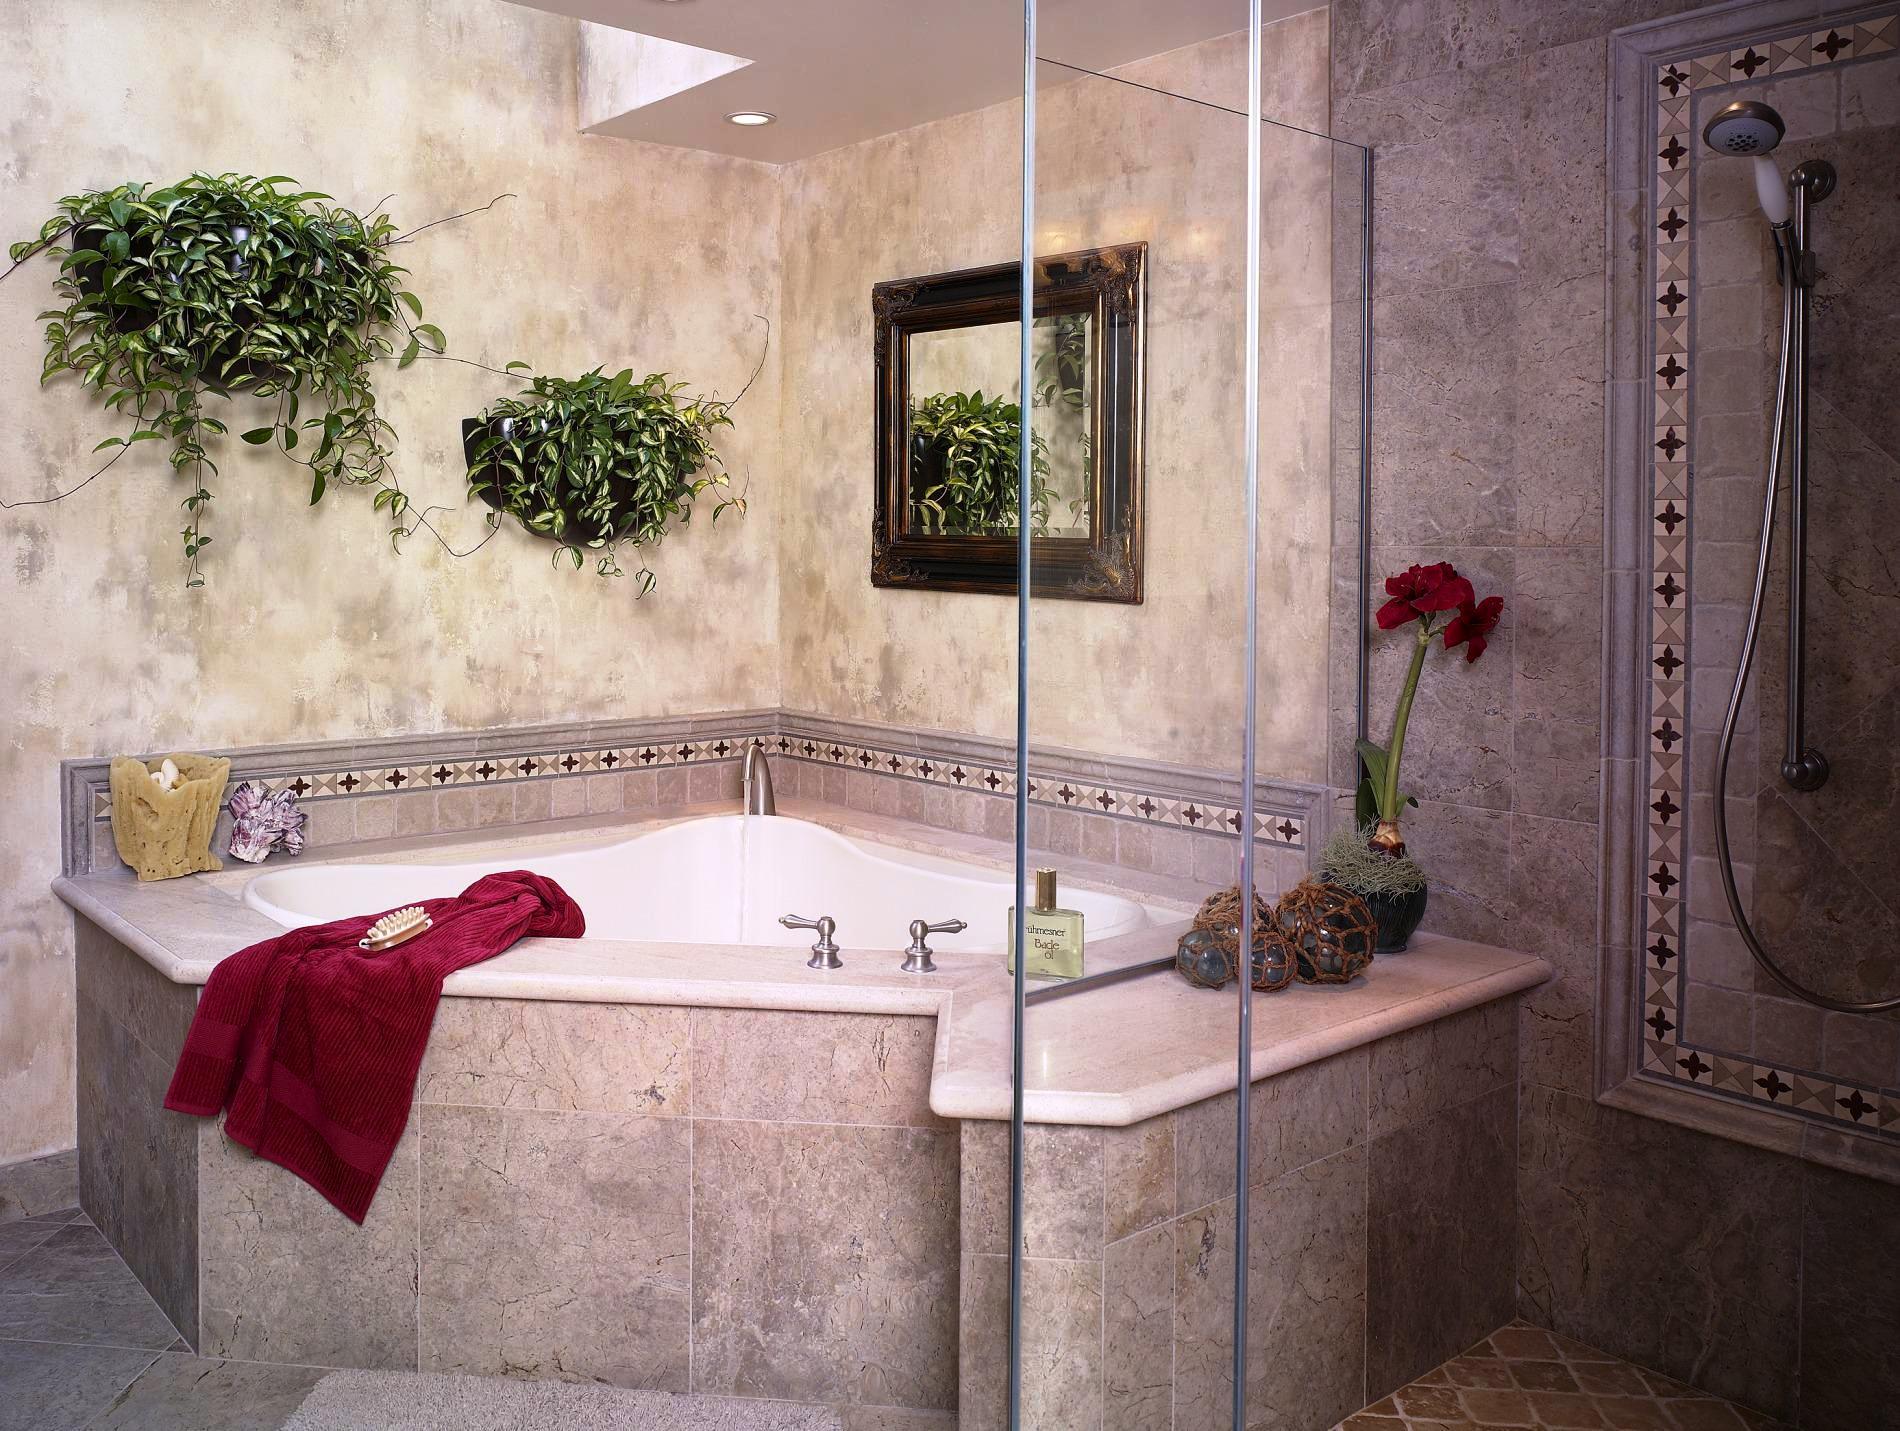 Corner Tub Shower Rod Schmidt Gallery Design